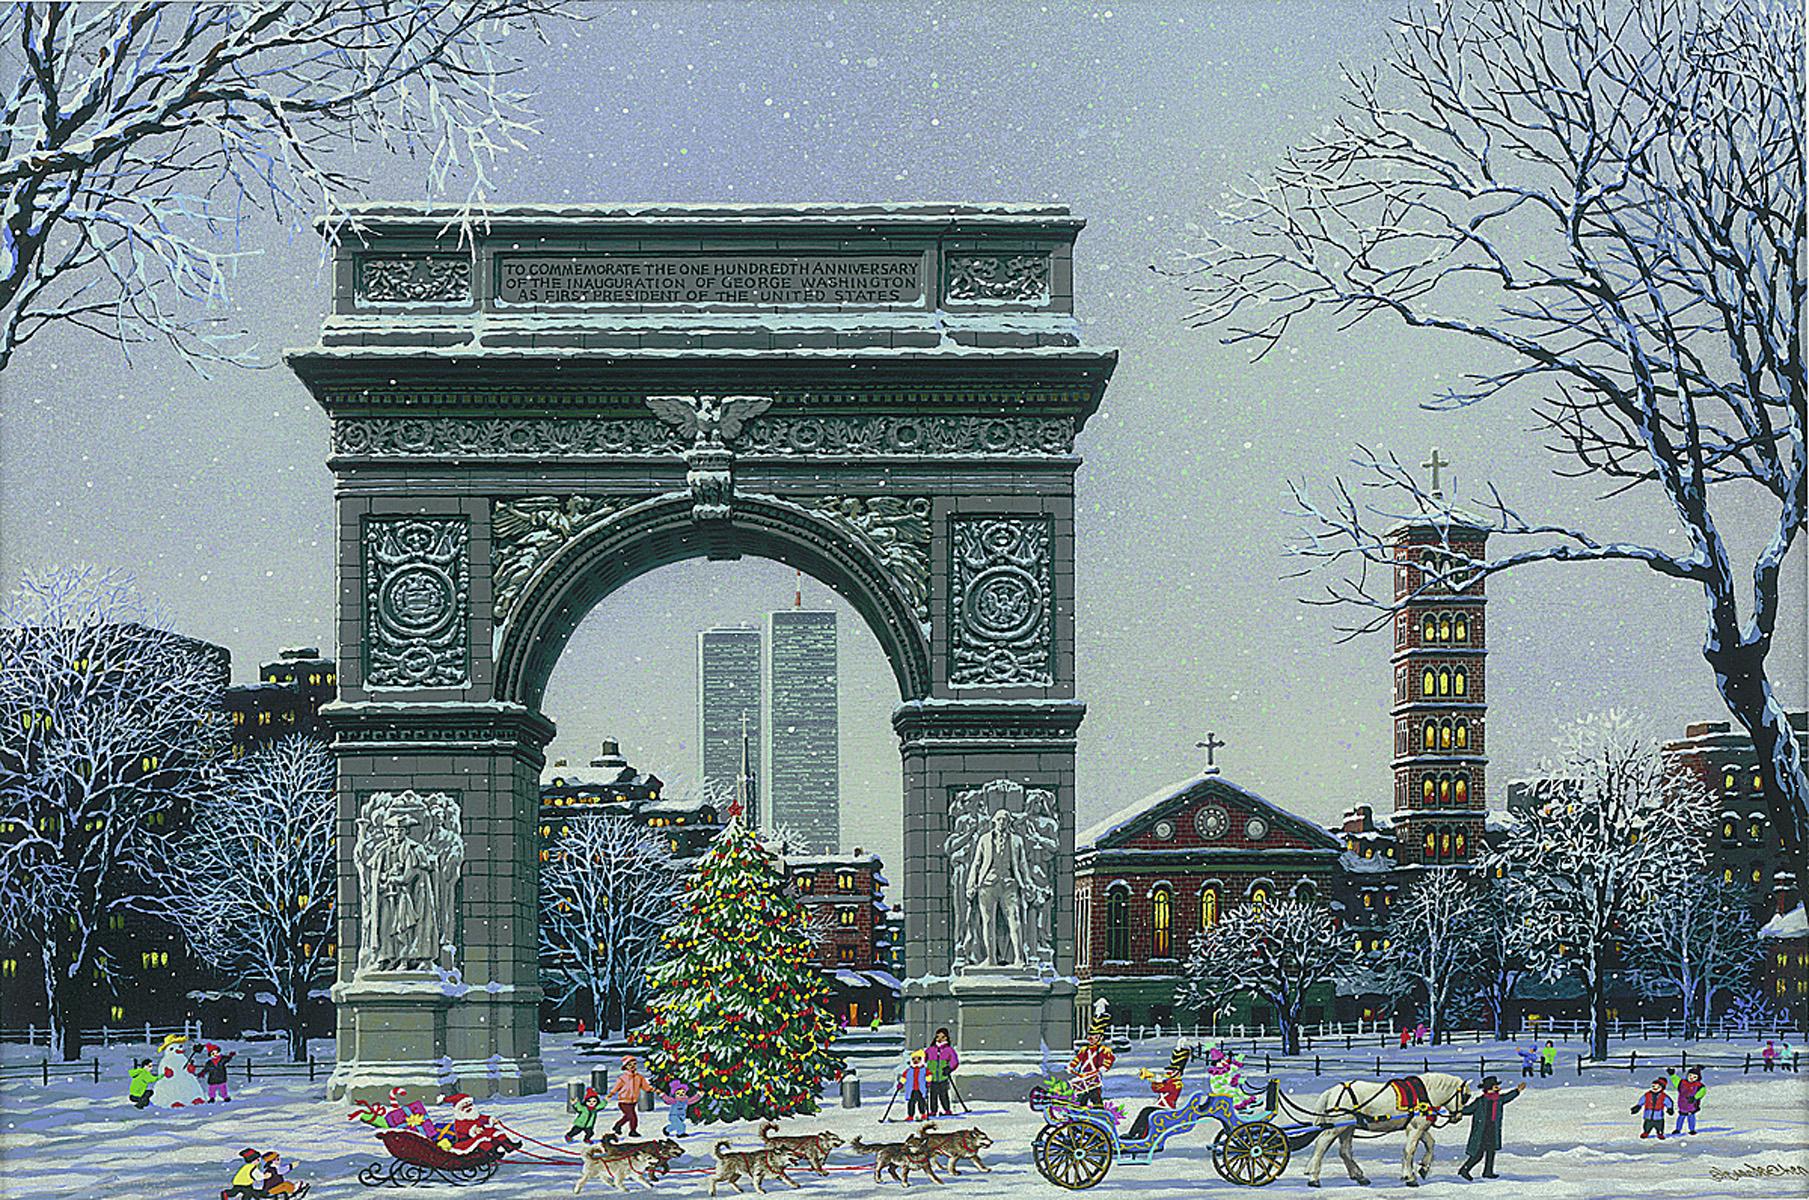 """Washington Square Park"" (2015), Alexander Chen, Park West Gallery Winter Art"